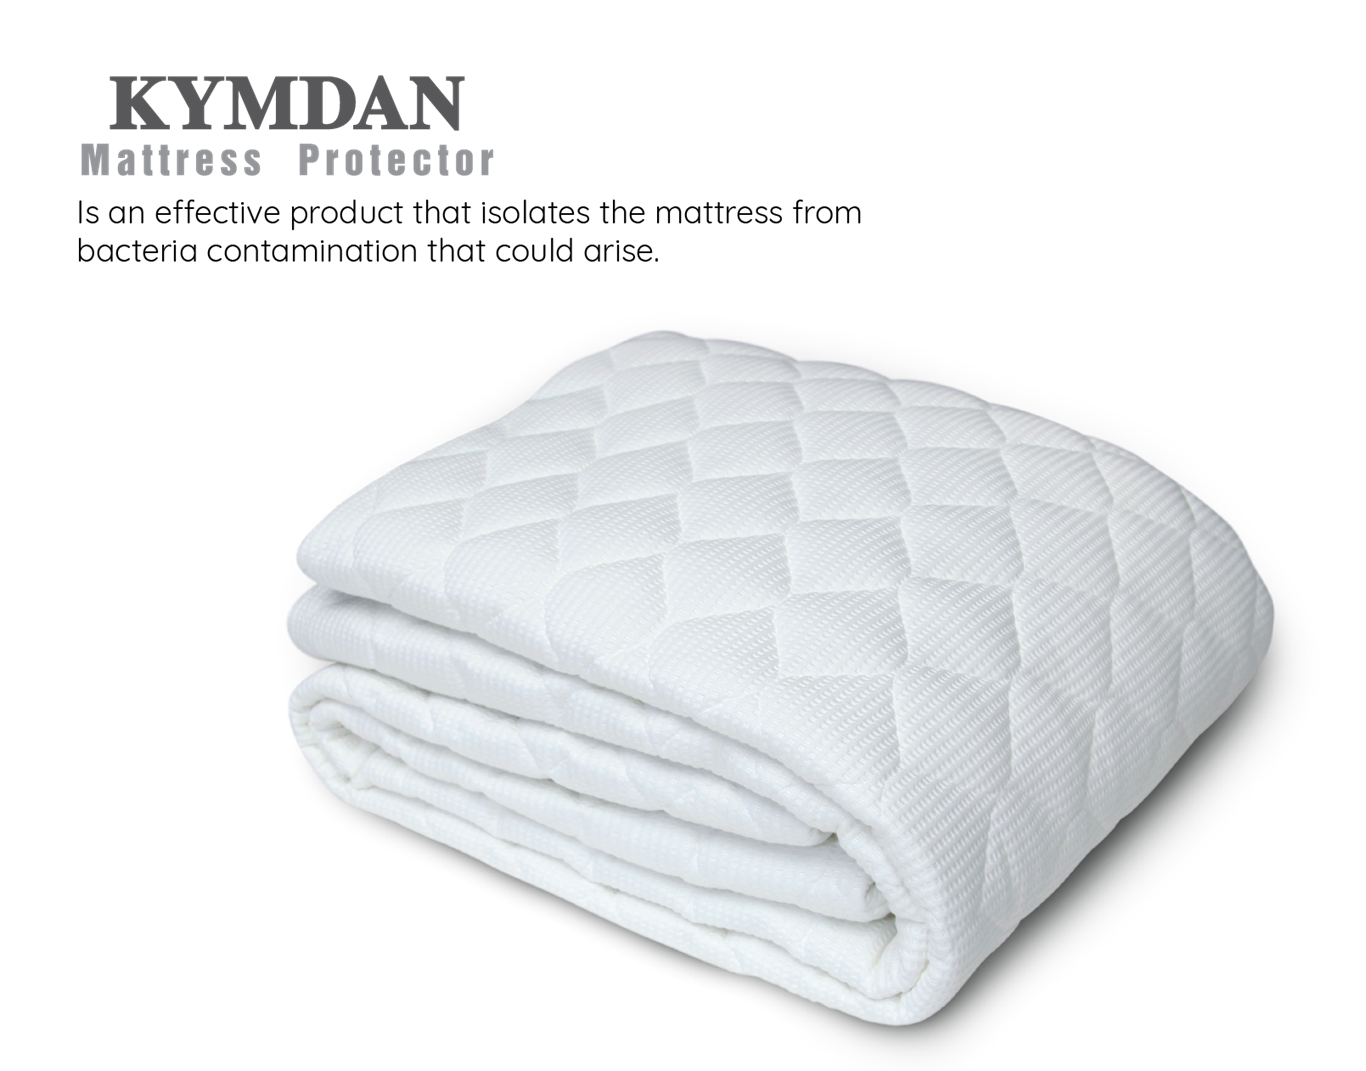 KYMDAN Mattress Protector